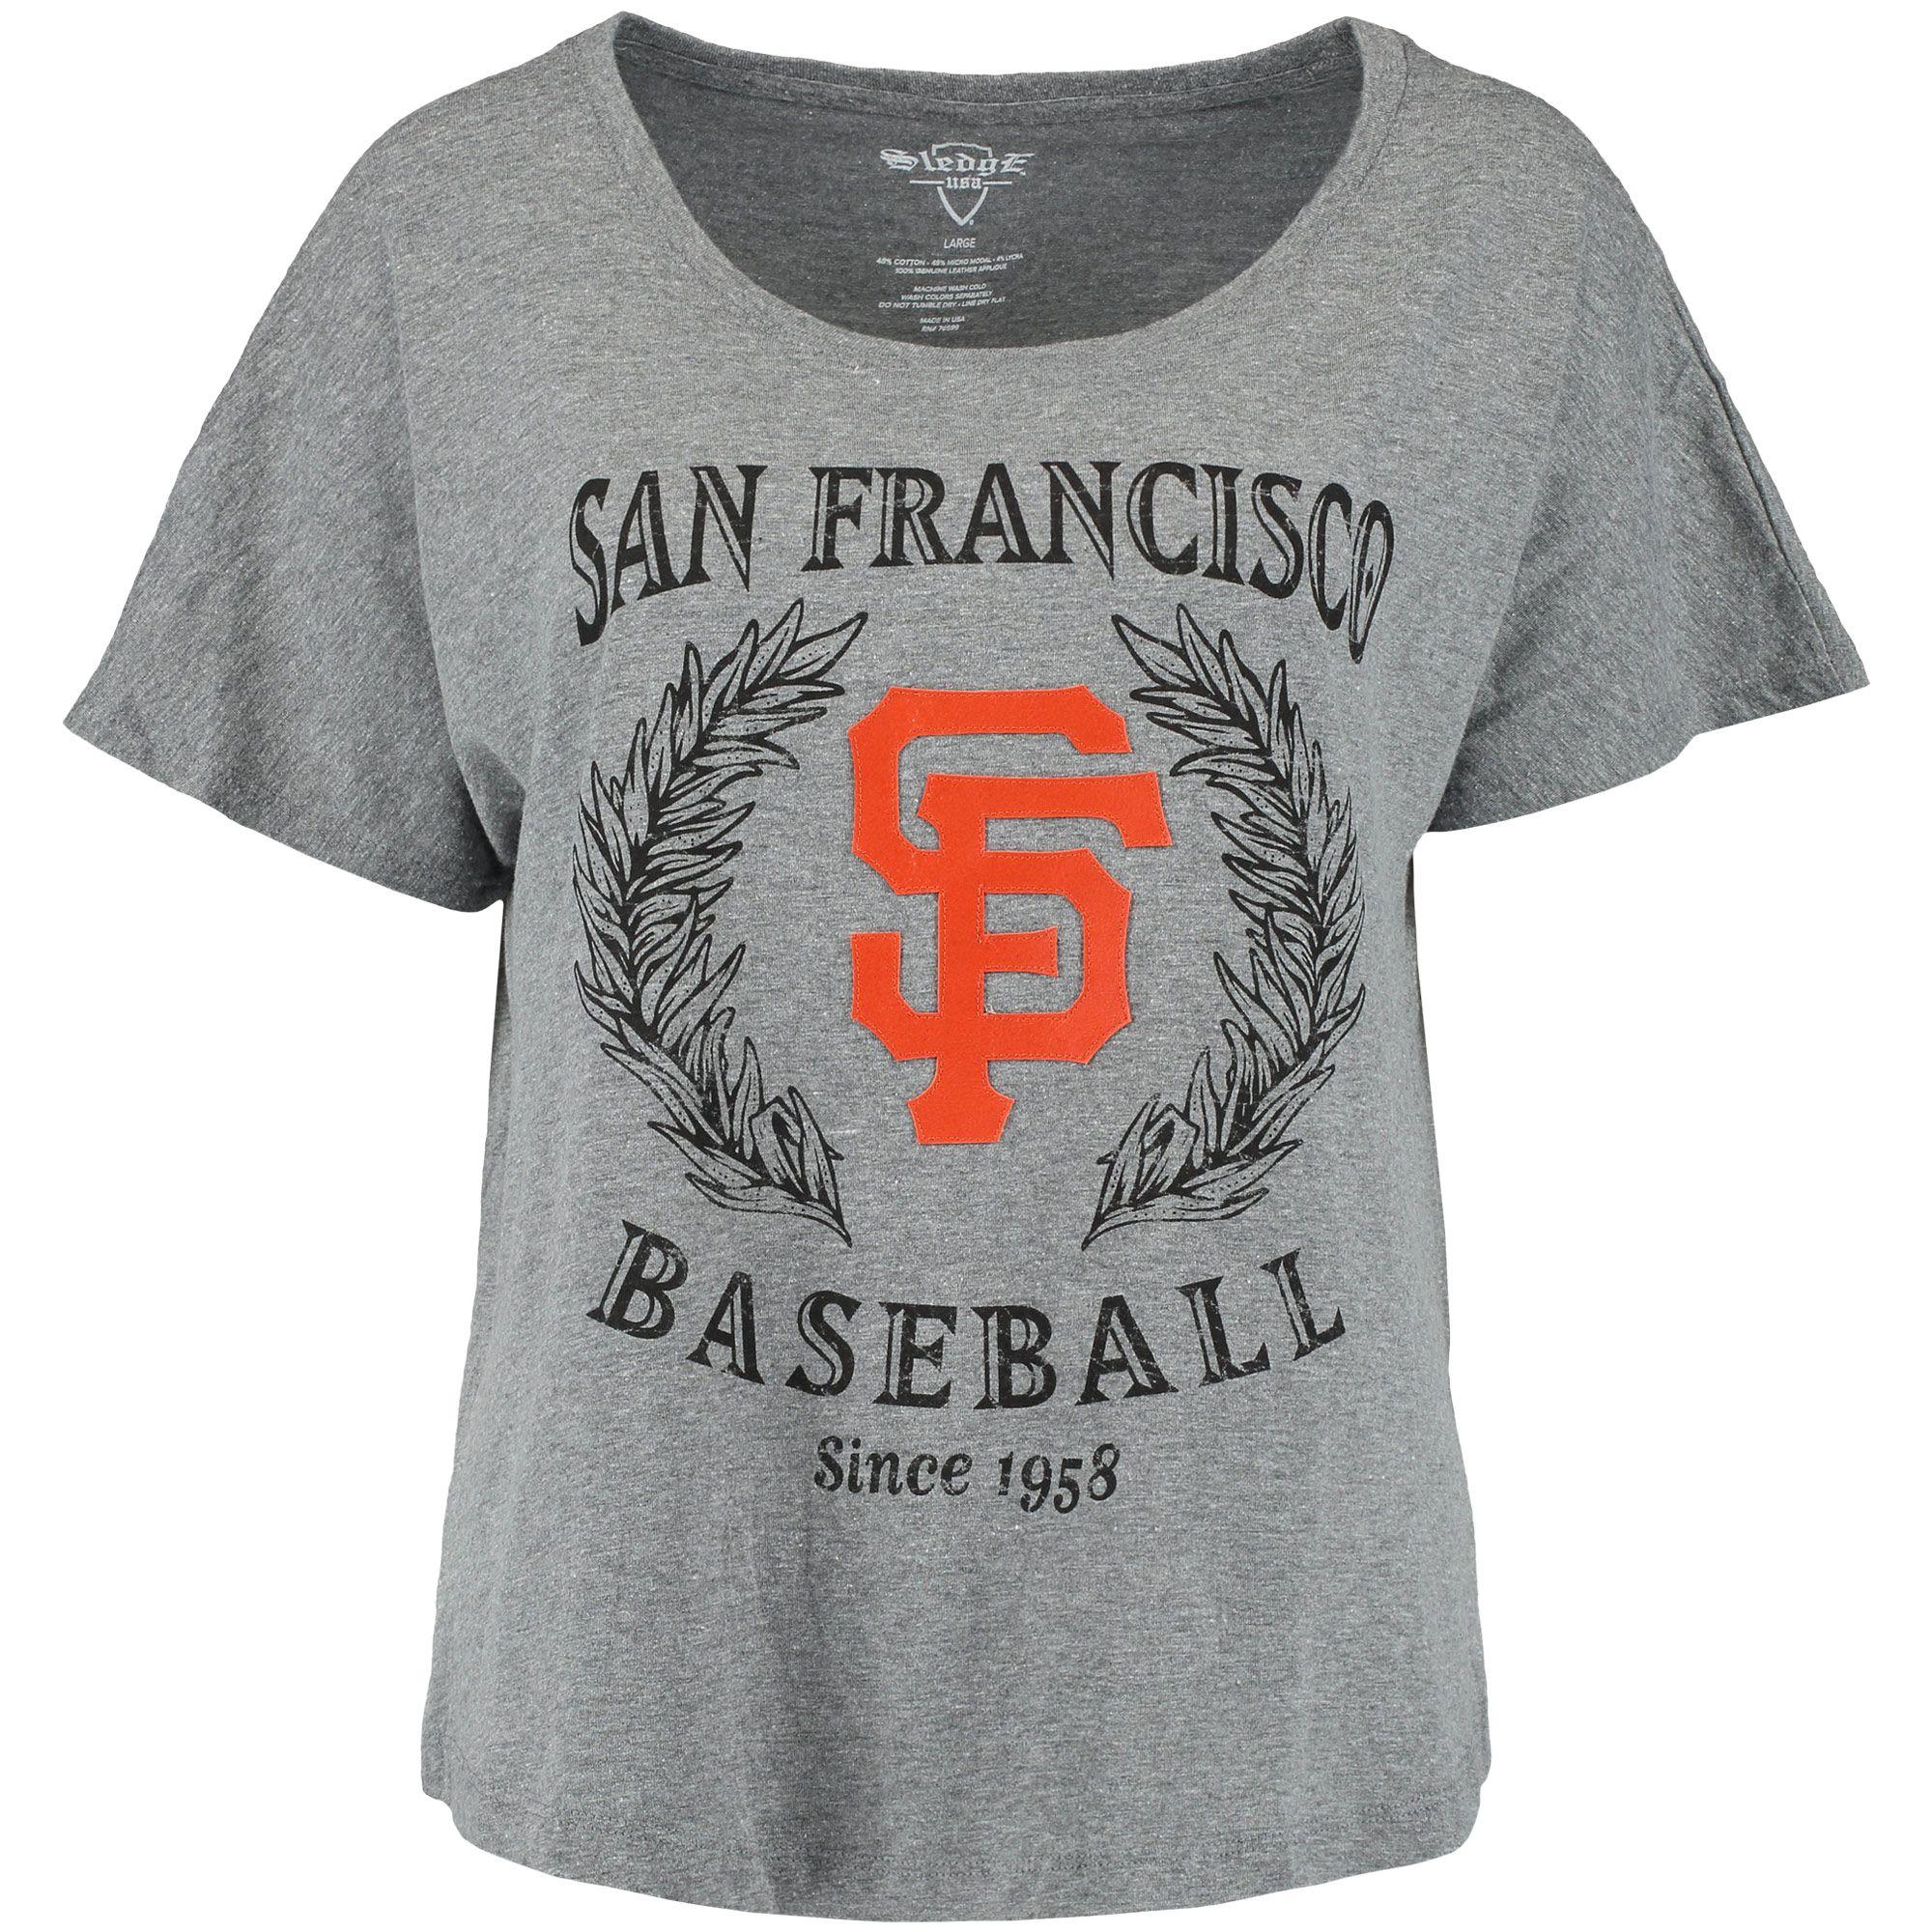 Predownload: Mlb San Francisco Giants Women S Team Logo Tri Blend Boyfriend T Shirt Boyfriend T Shirt San Francisco Giants Shirts [ 2000 x 2000 Pixel ]